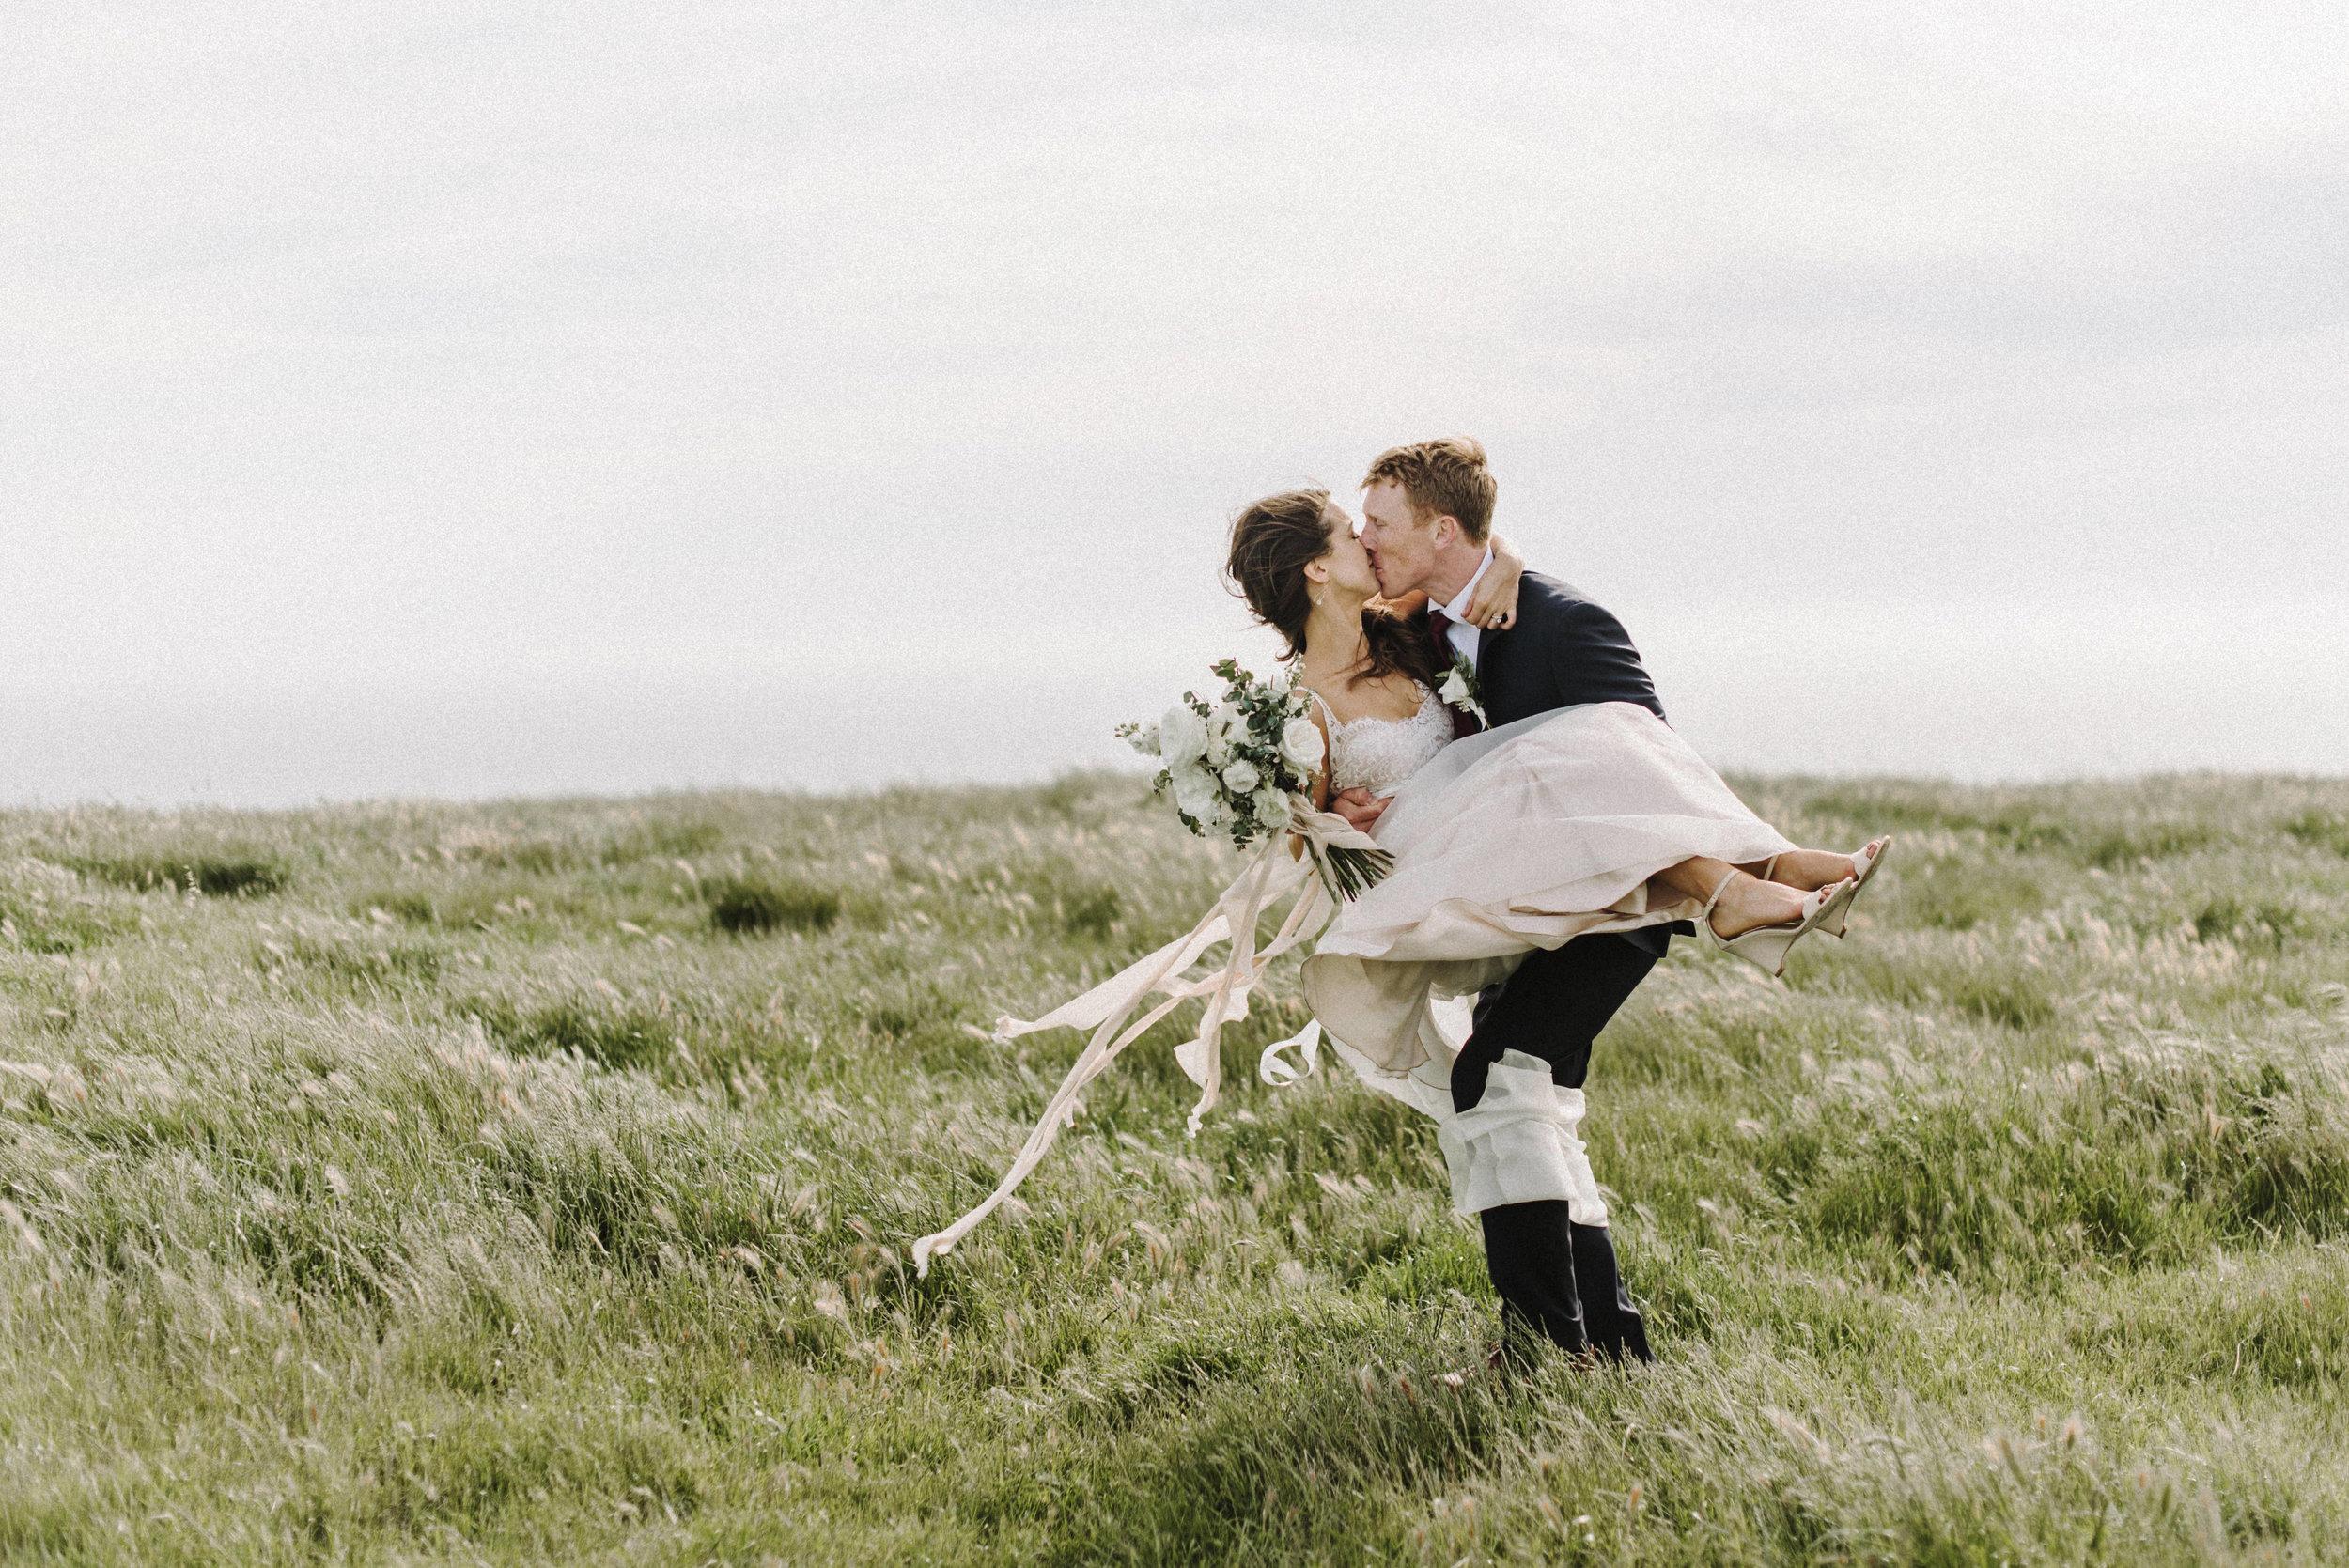 Shanon & John - Image by Love Ridge PhotographyFlorals by Rekindle